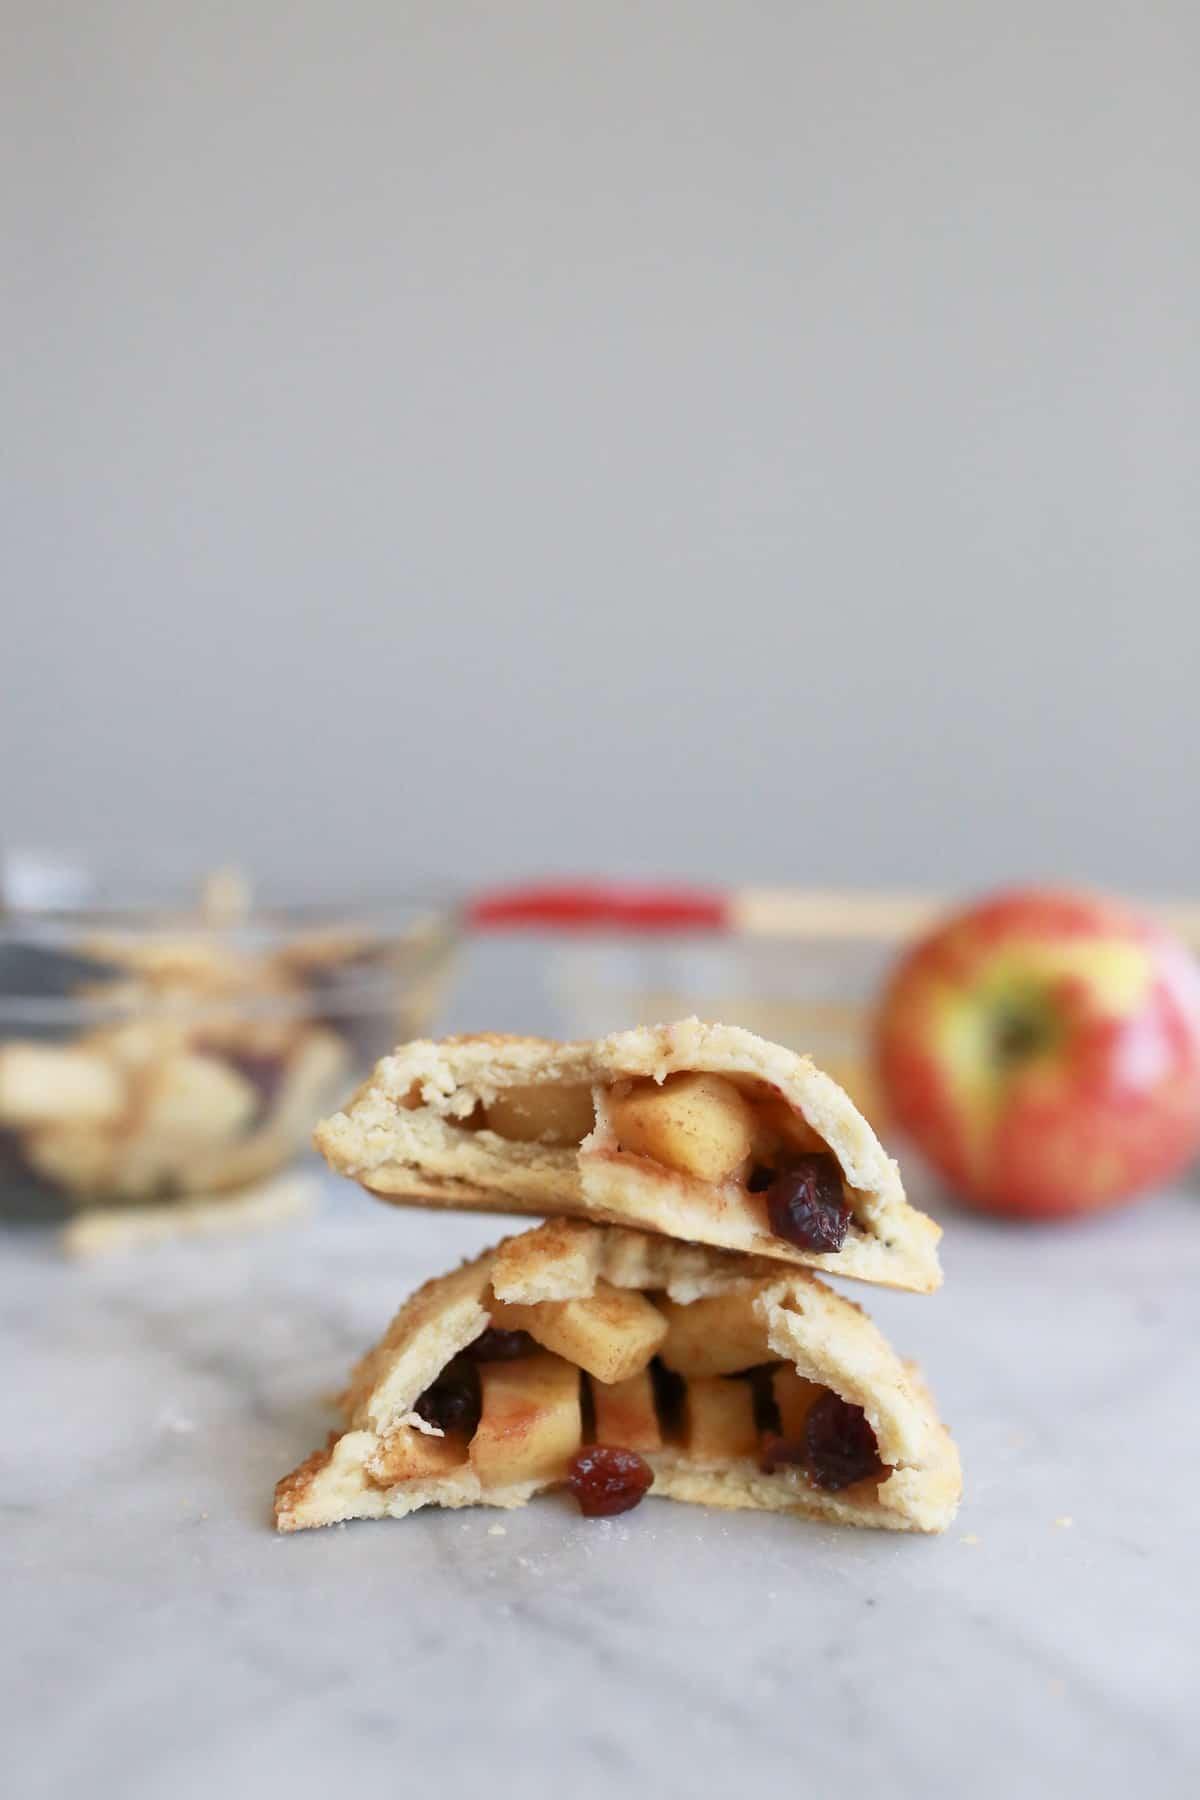 Apple Cranberry Hand Pie Recipe - My Style Vita